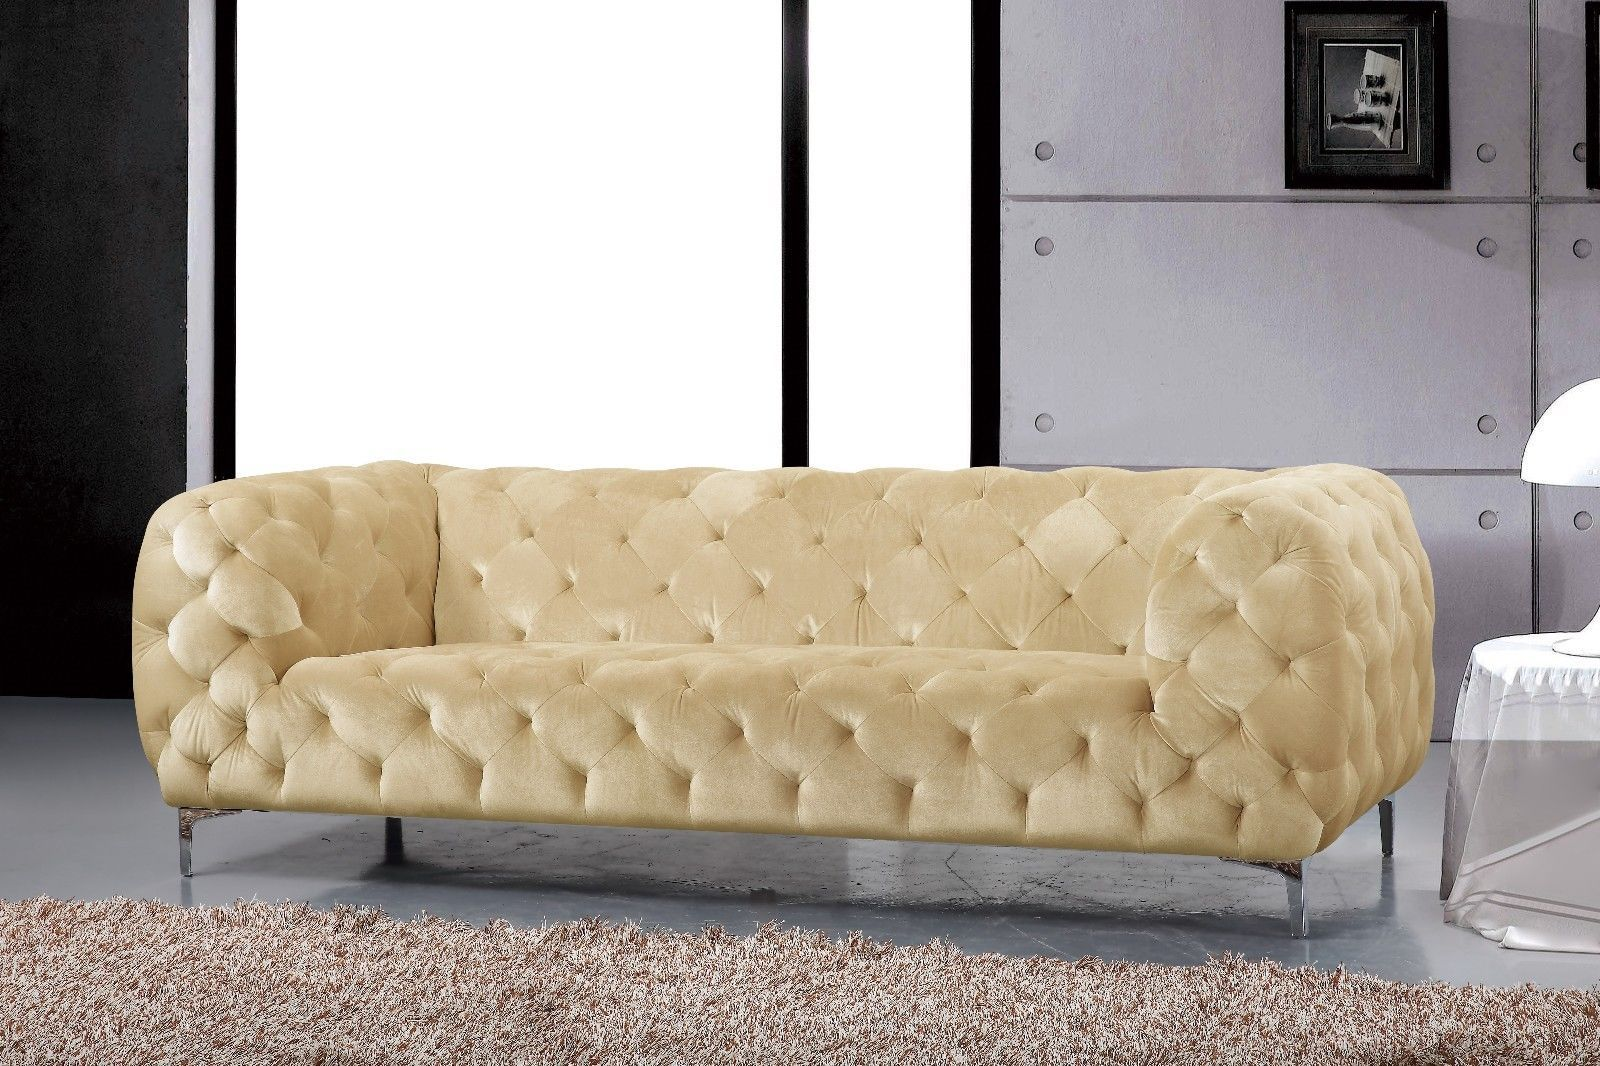 Meridian 646 Mercer Living Room Set 3pcs in Beige Chrome Legs Contemporary Style